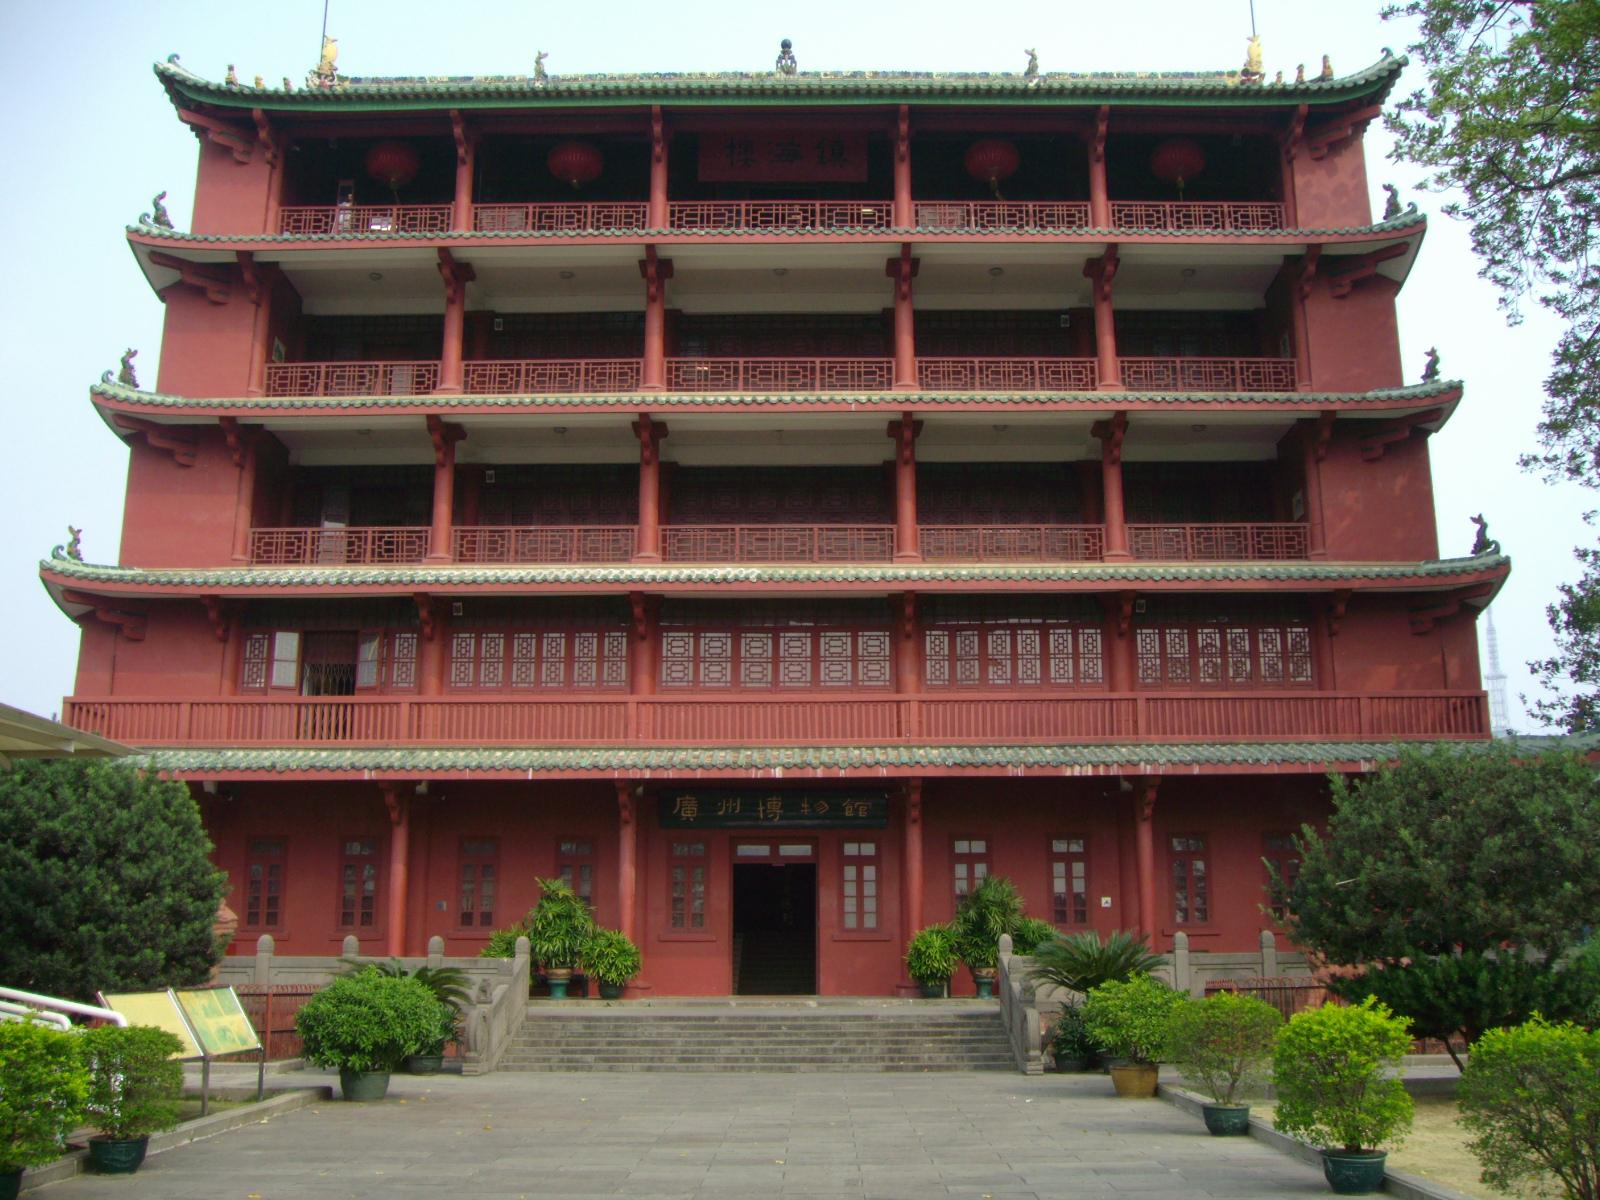 Wieża Zhenhai (Kanton)